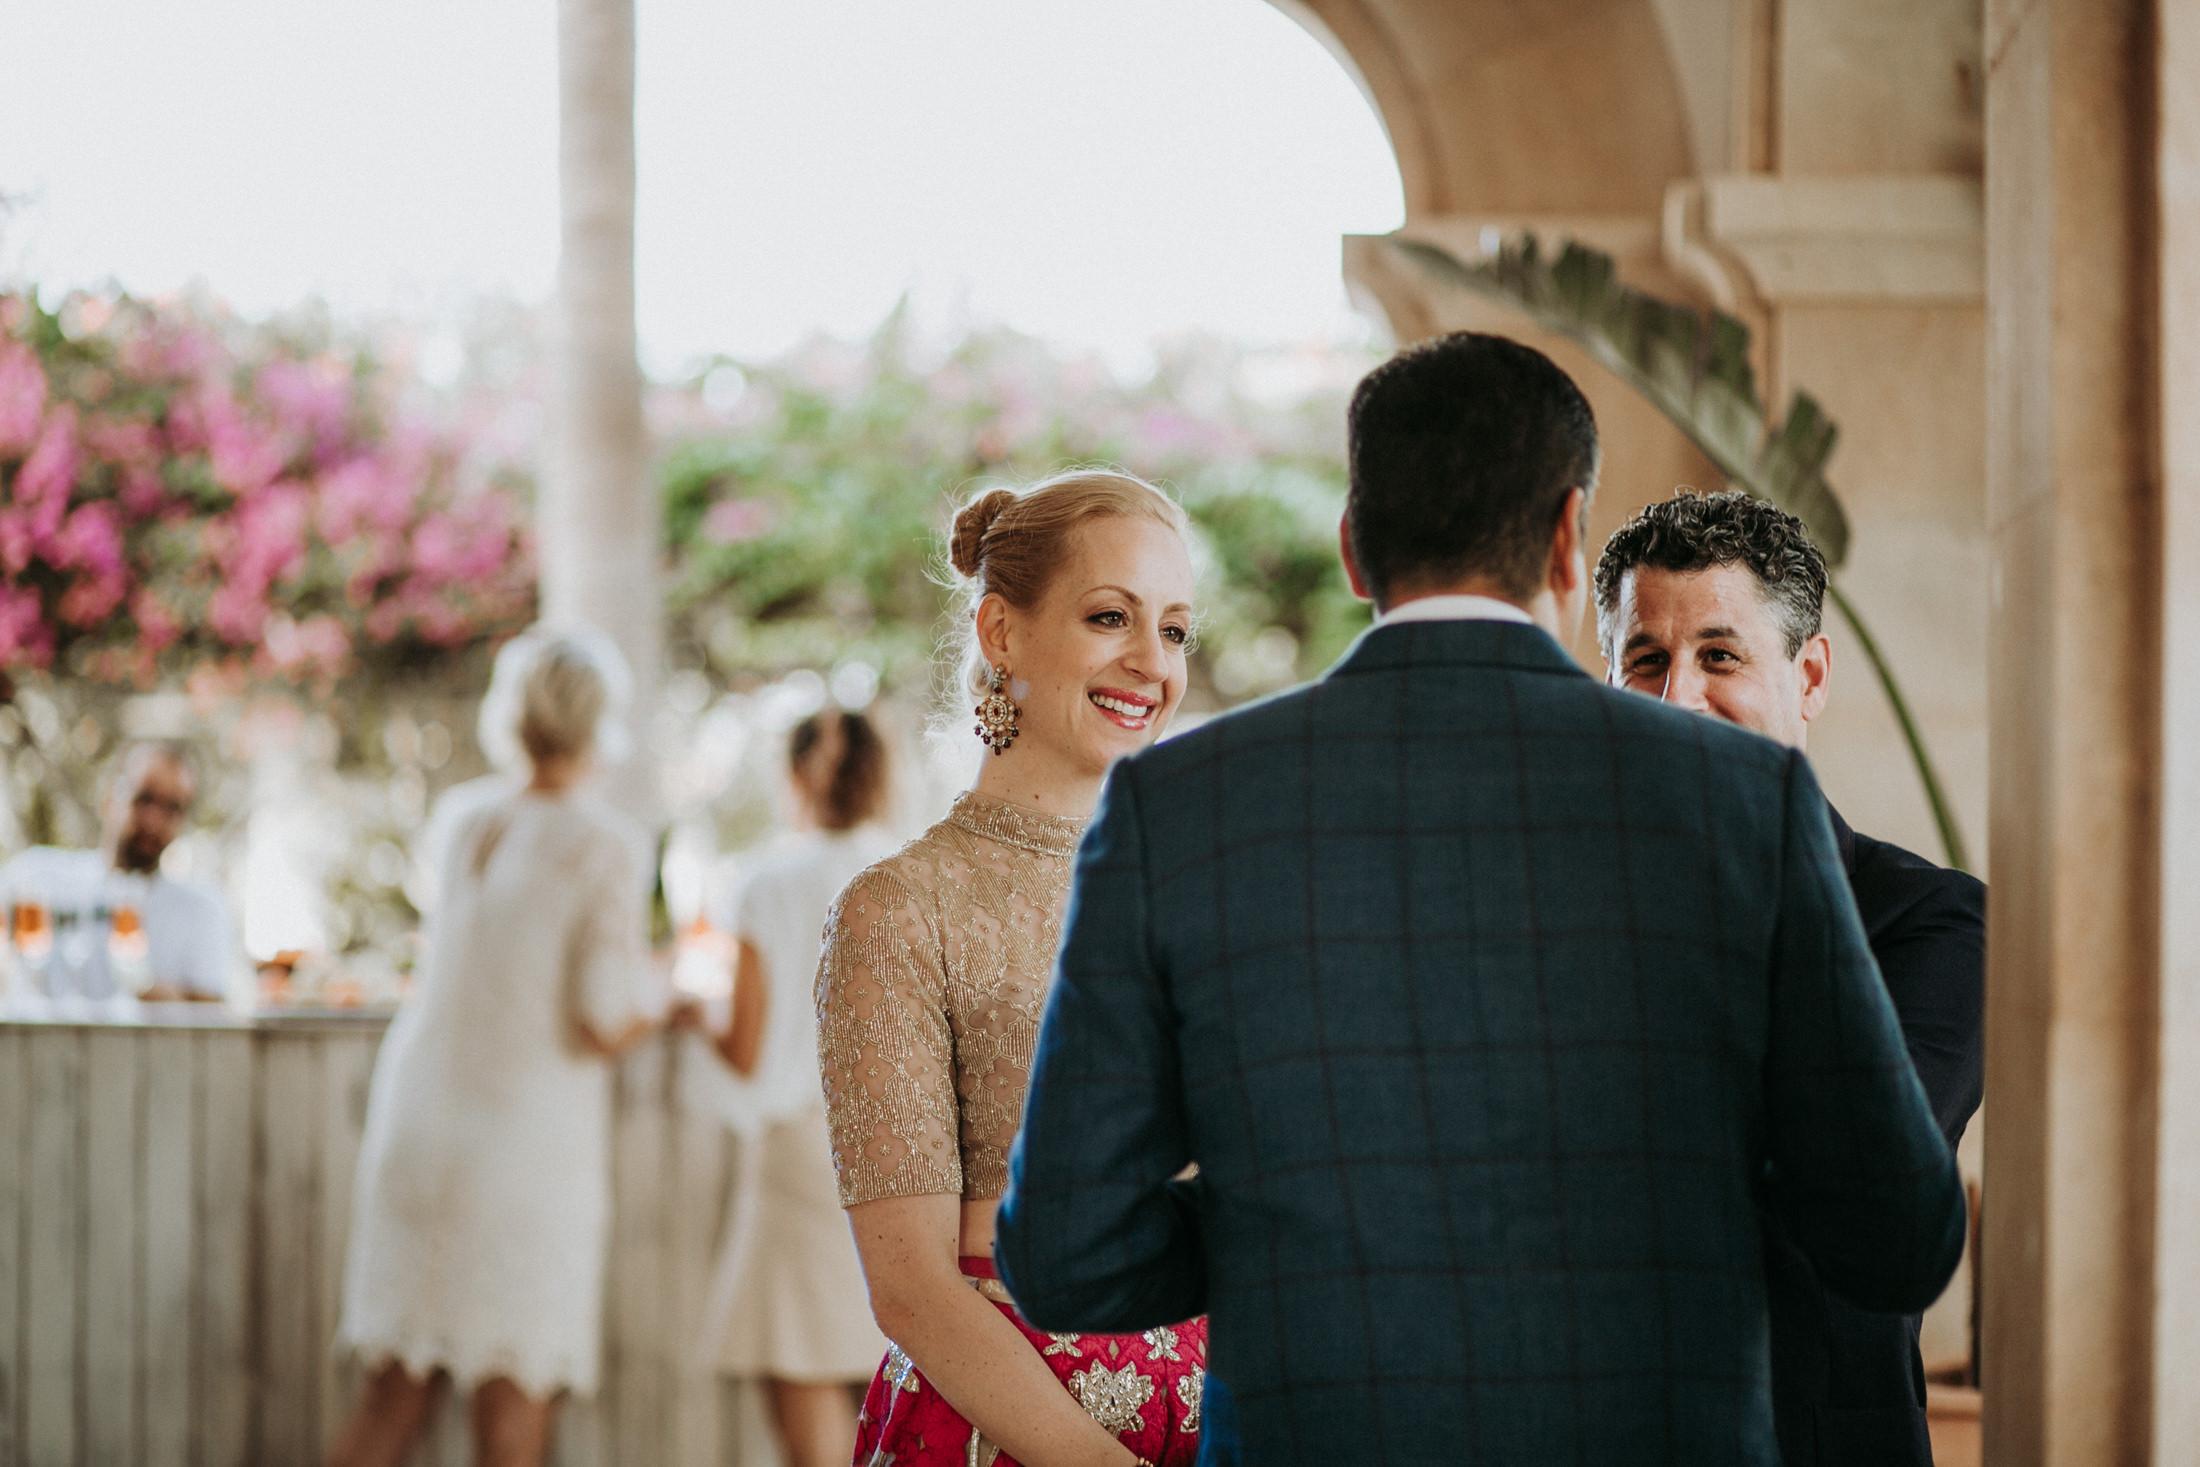 Wedding_Photographer_Mallorca_Daniela-Marquardt_Photography_New_York_Iceland_Tuscany_Santorini_Portugal_Austria_Bavaria_Elopement_Hochzeitsfotograf_AntjeRajat1_38